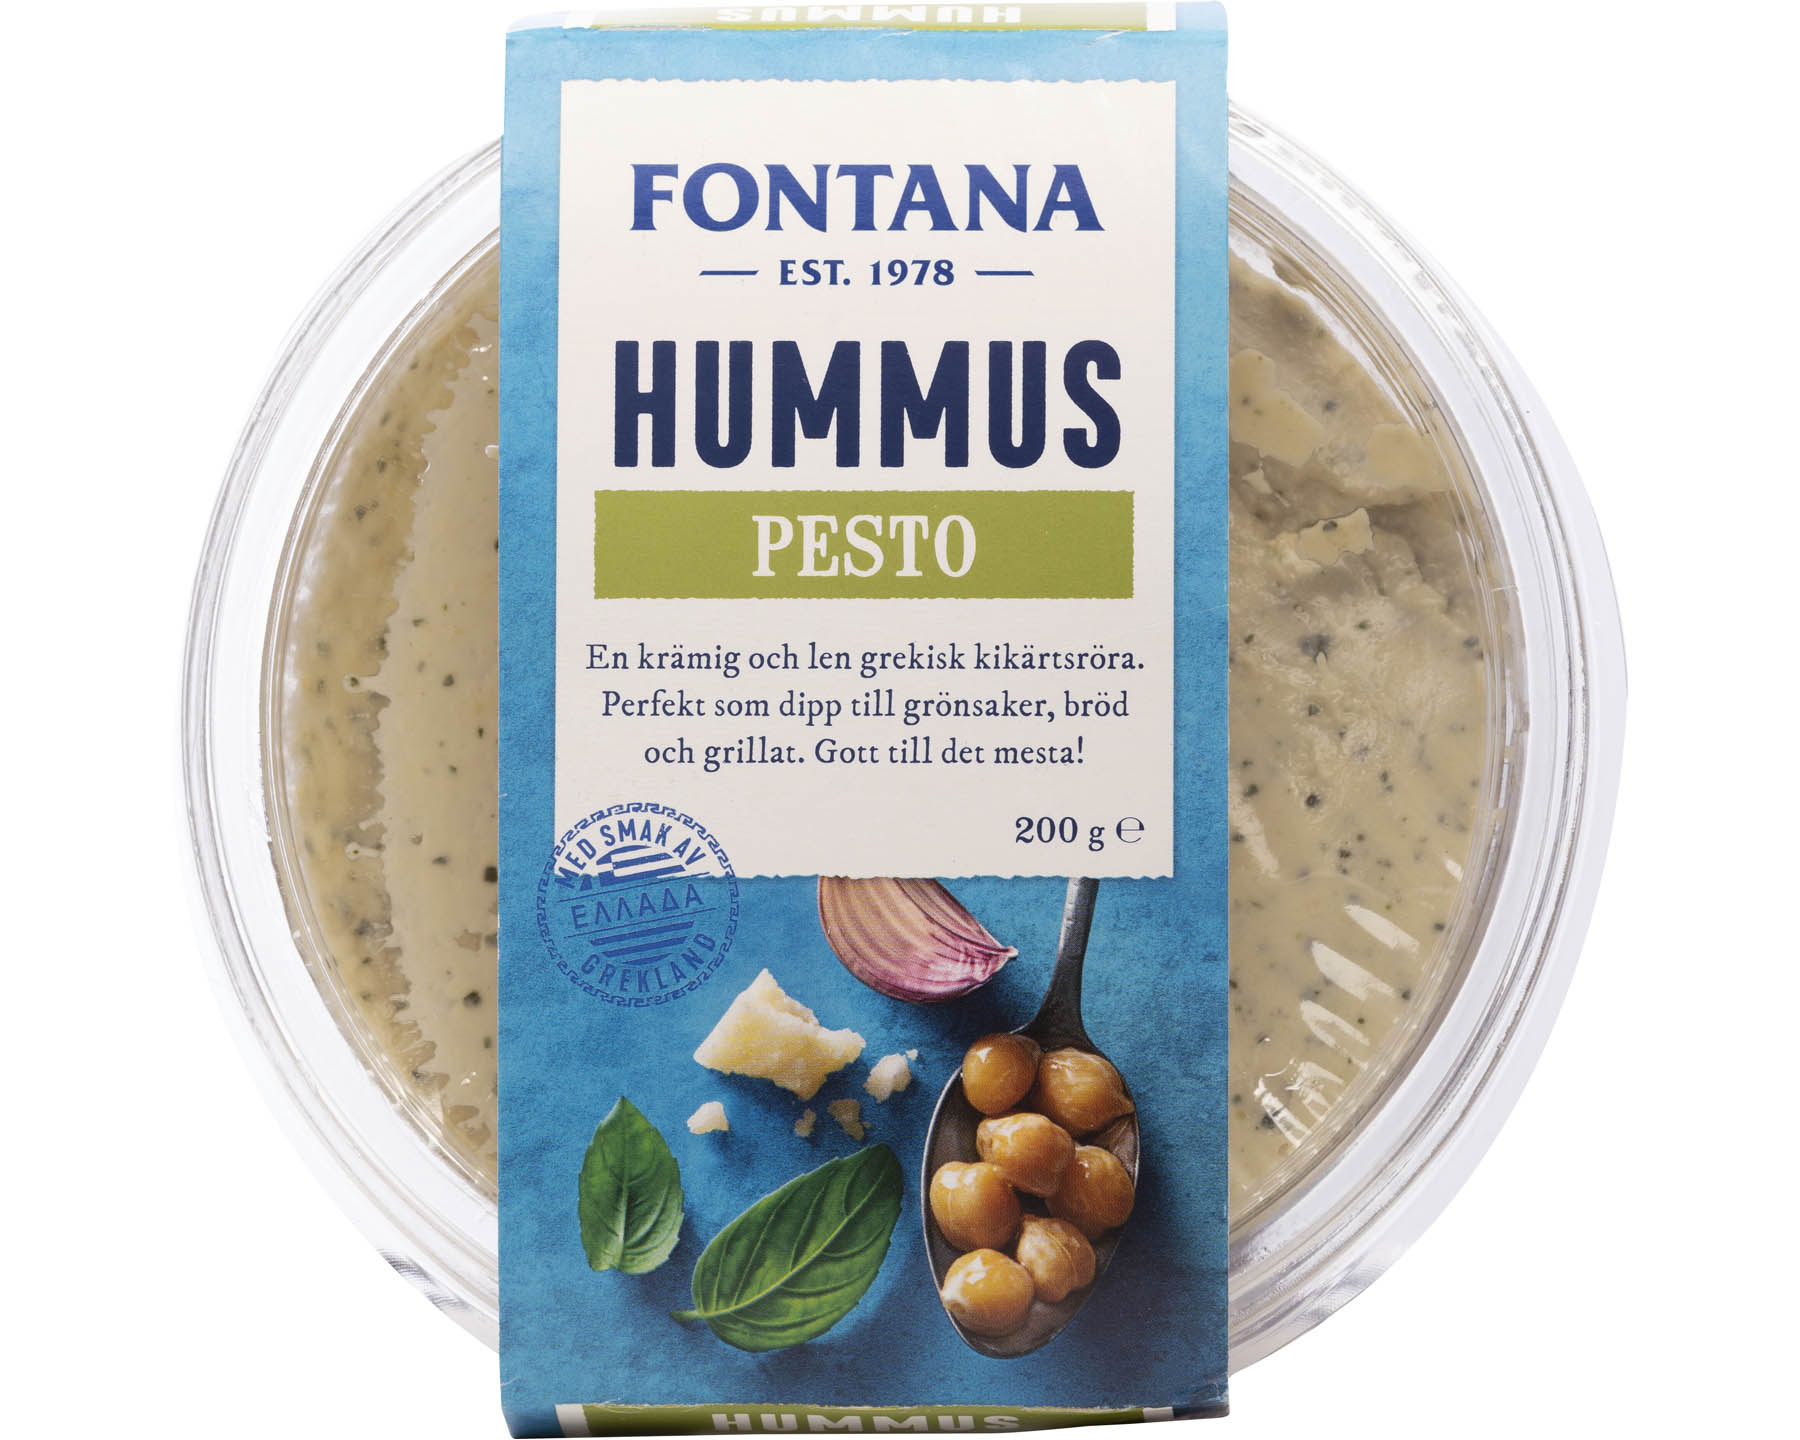 Fontana Hummus Pesto